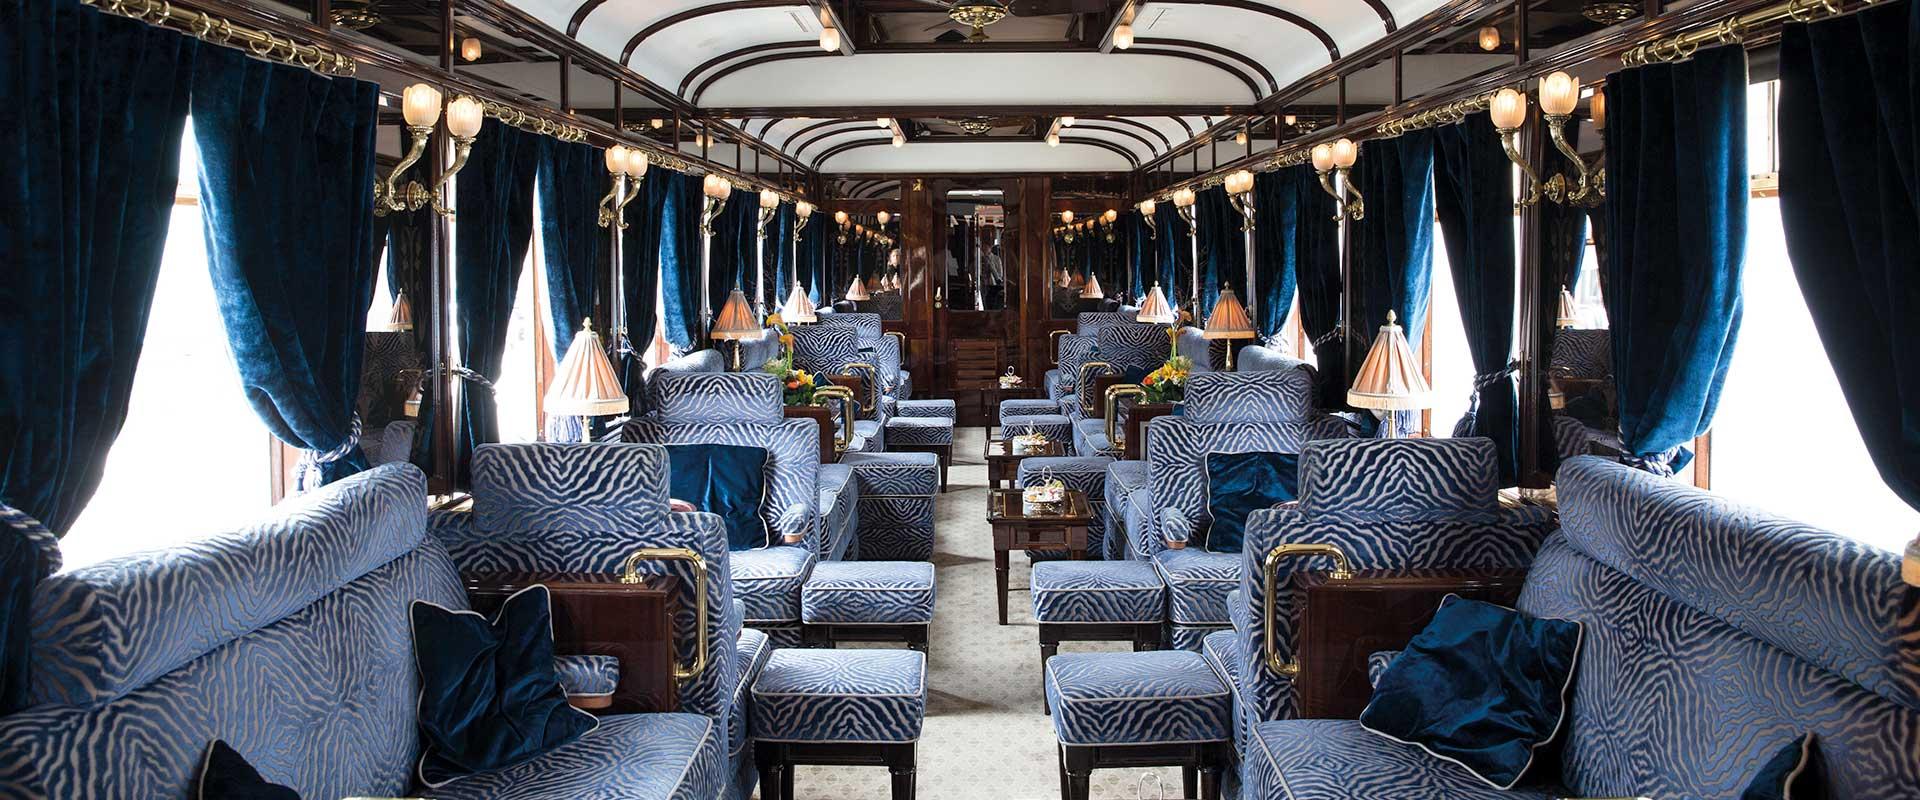 Venice Simplon-Orient-Express de Paris a Istambul